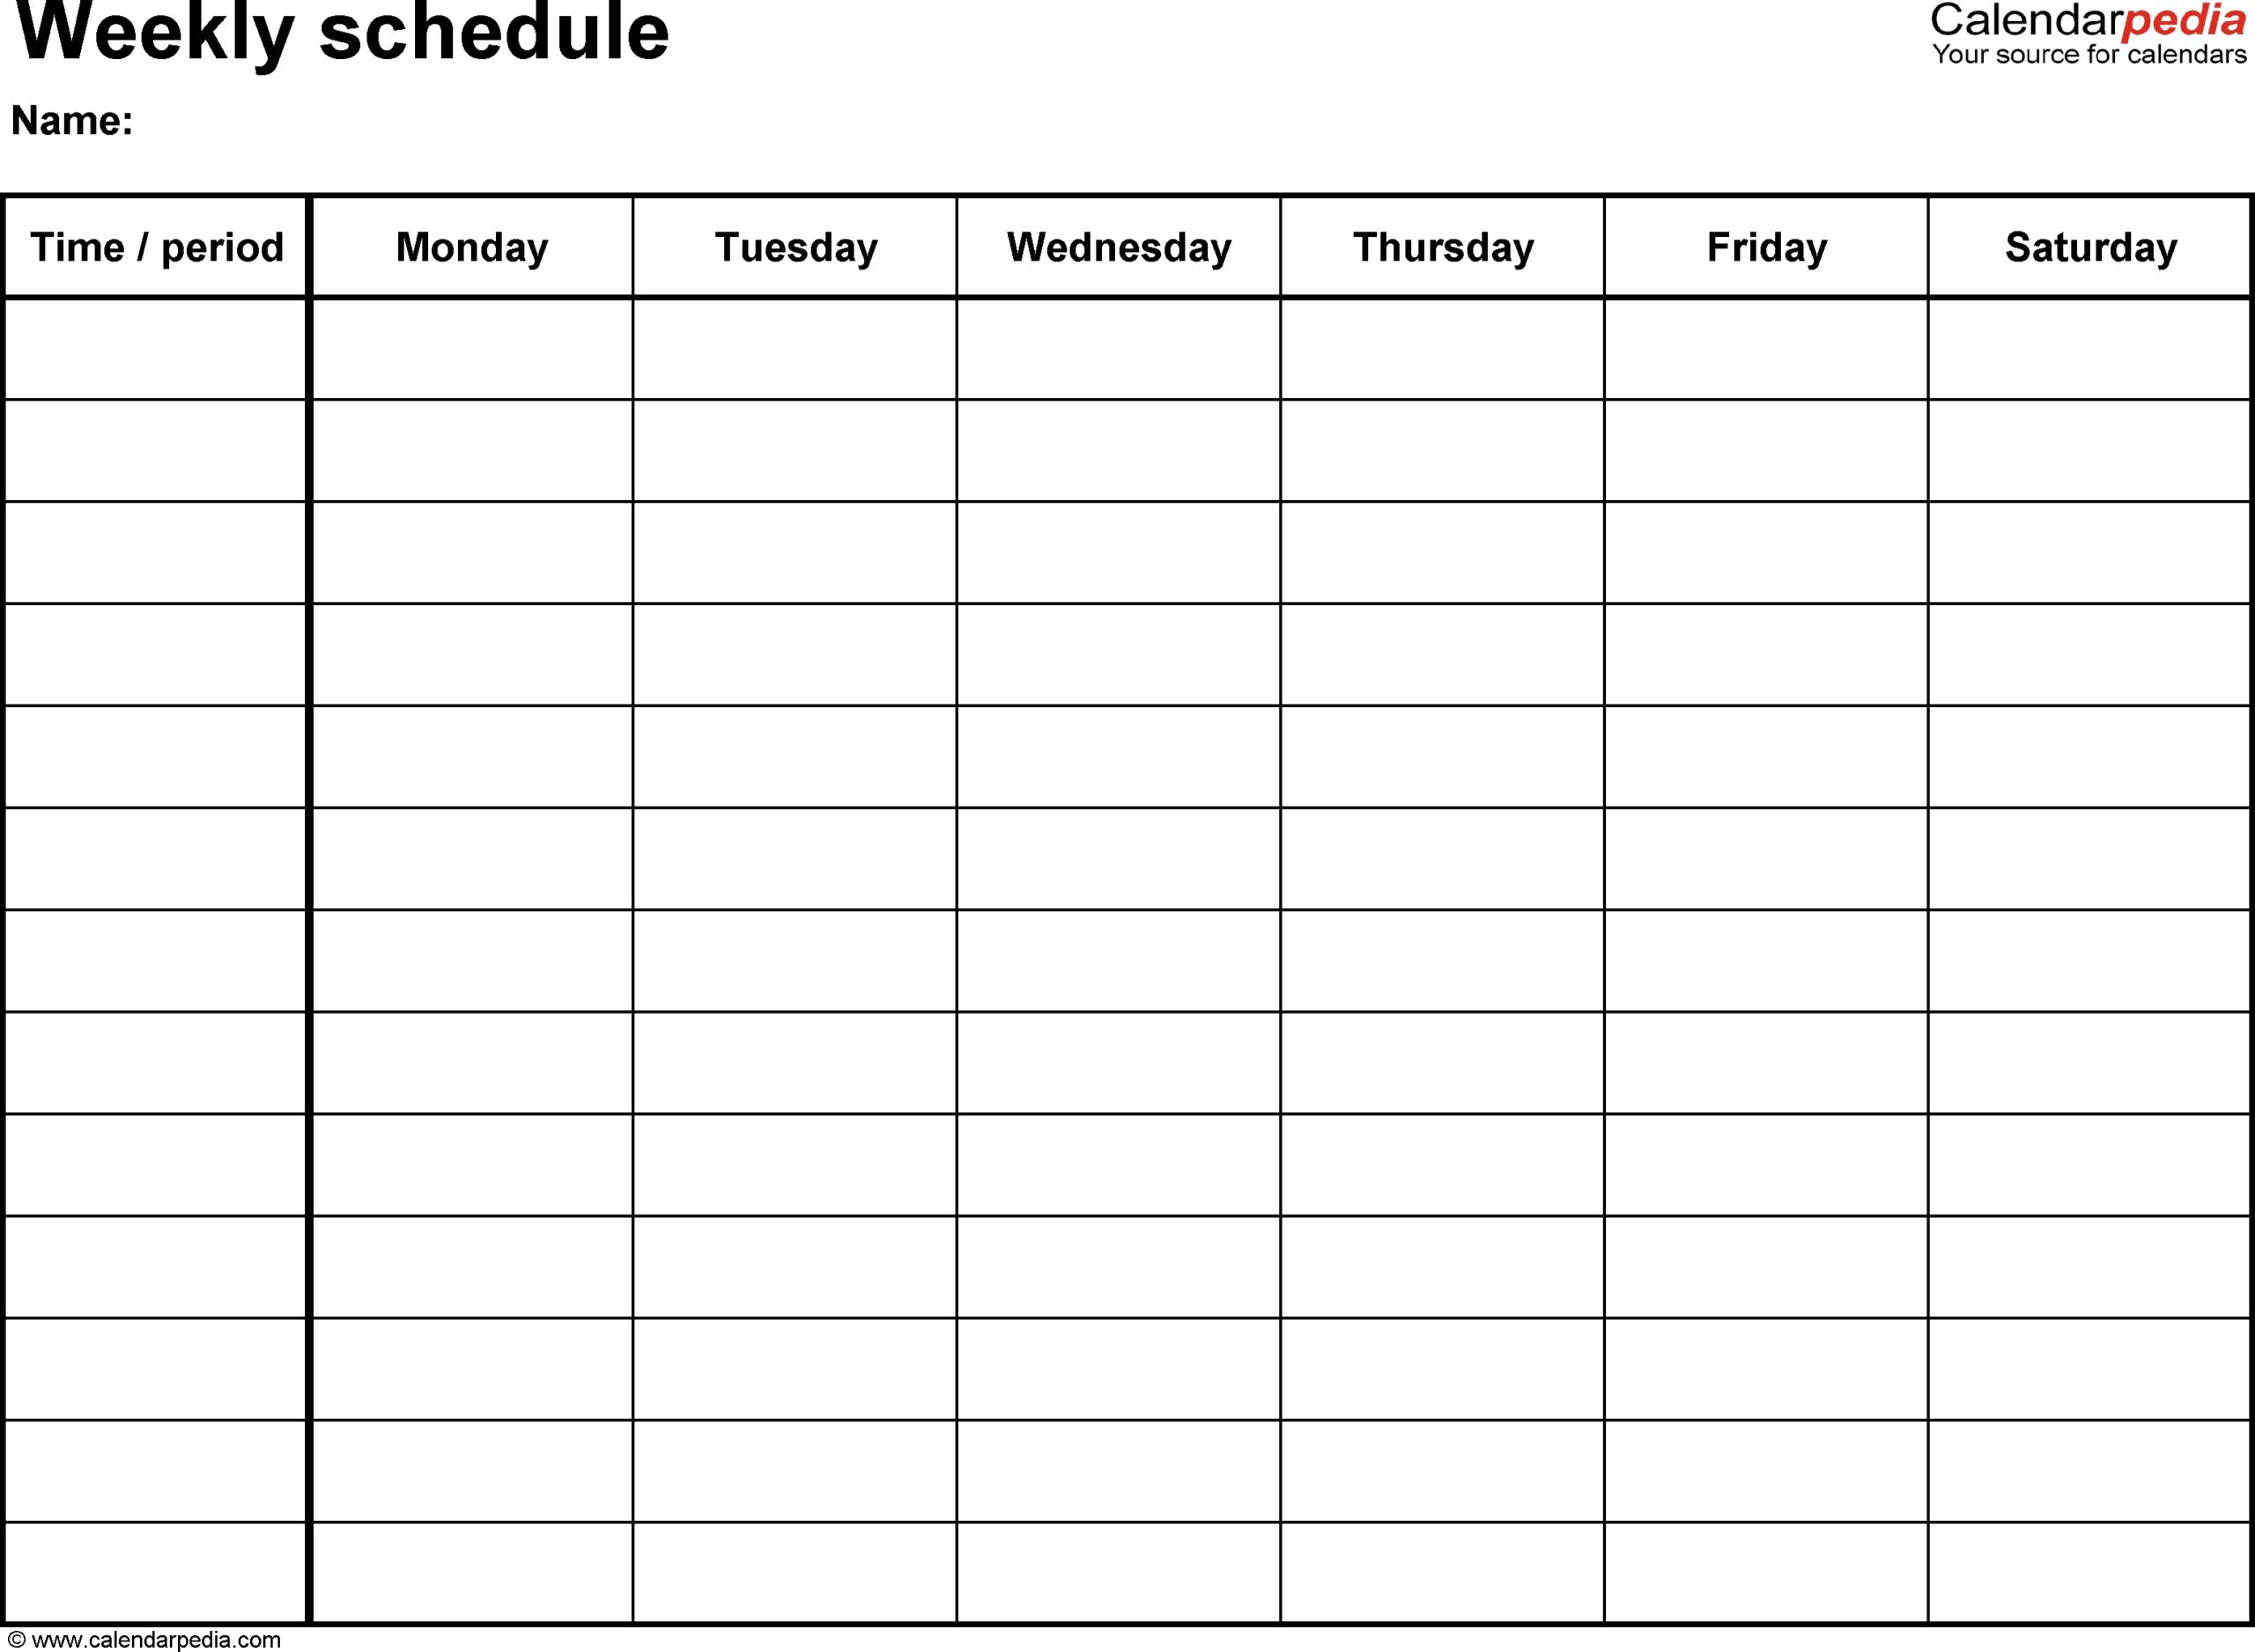 Printable Monthly Calendar Sunday To Saturday No Dates pertaining to Weekly Calendar Sunday To Saturday